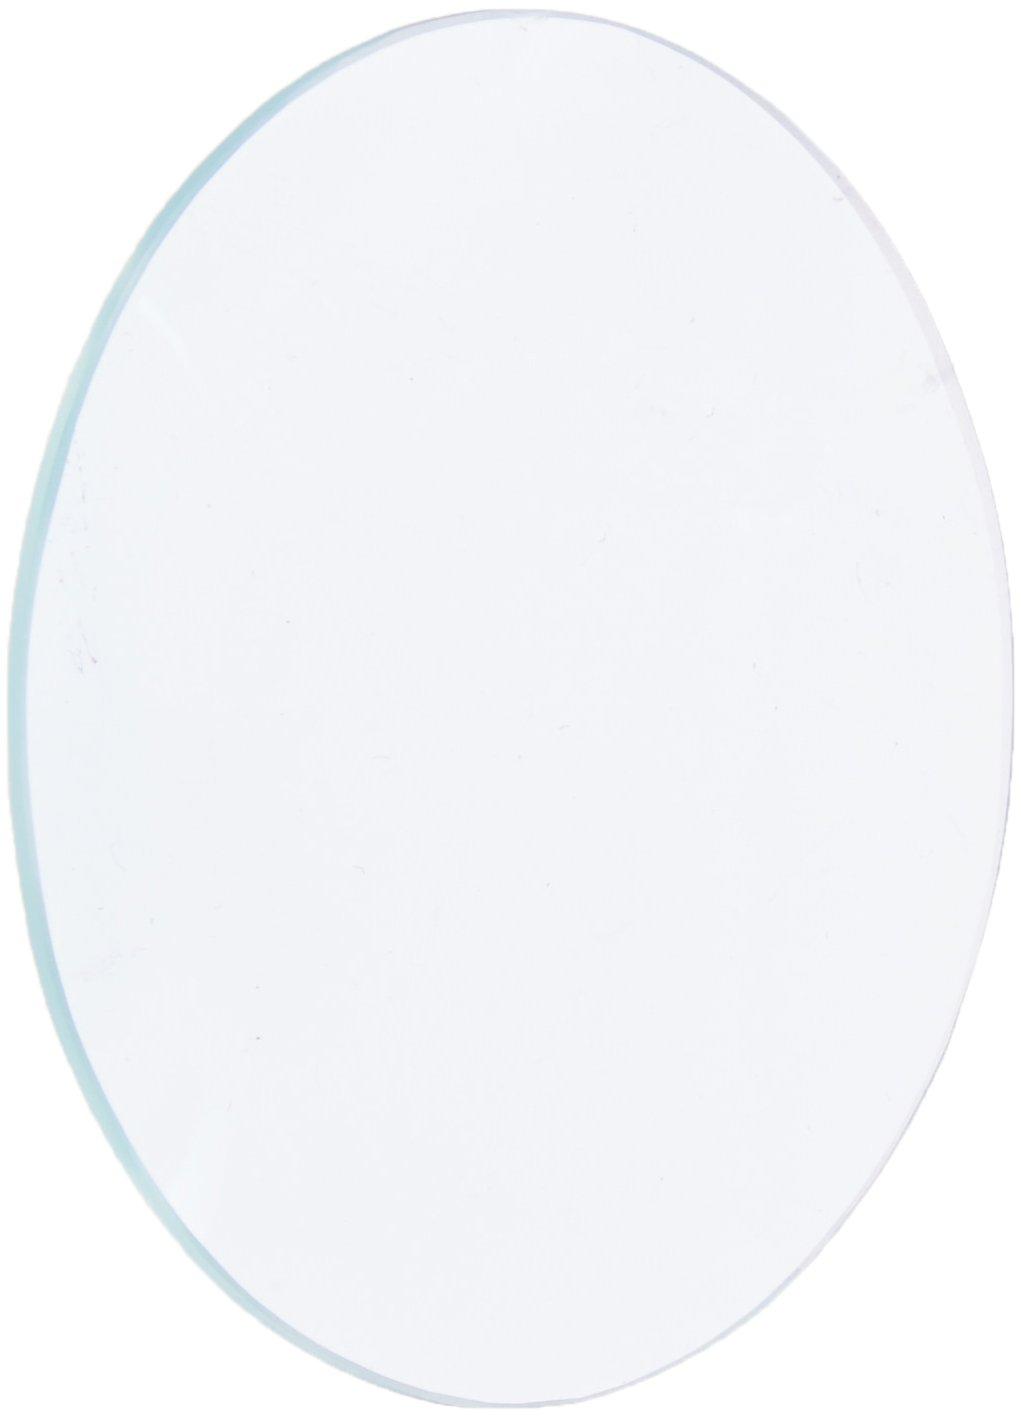 Ajax Scientific Polished Glass Double-Convex (Bi-Convex) Lens, Spherical, 50 mm Diameter, 250 mm Focal Length LI152-0250